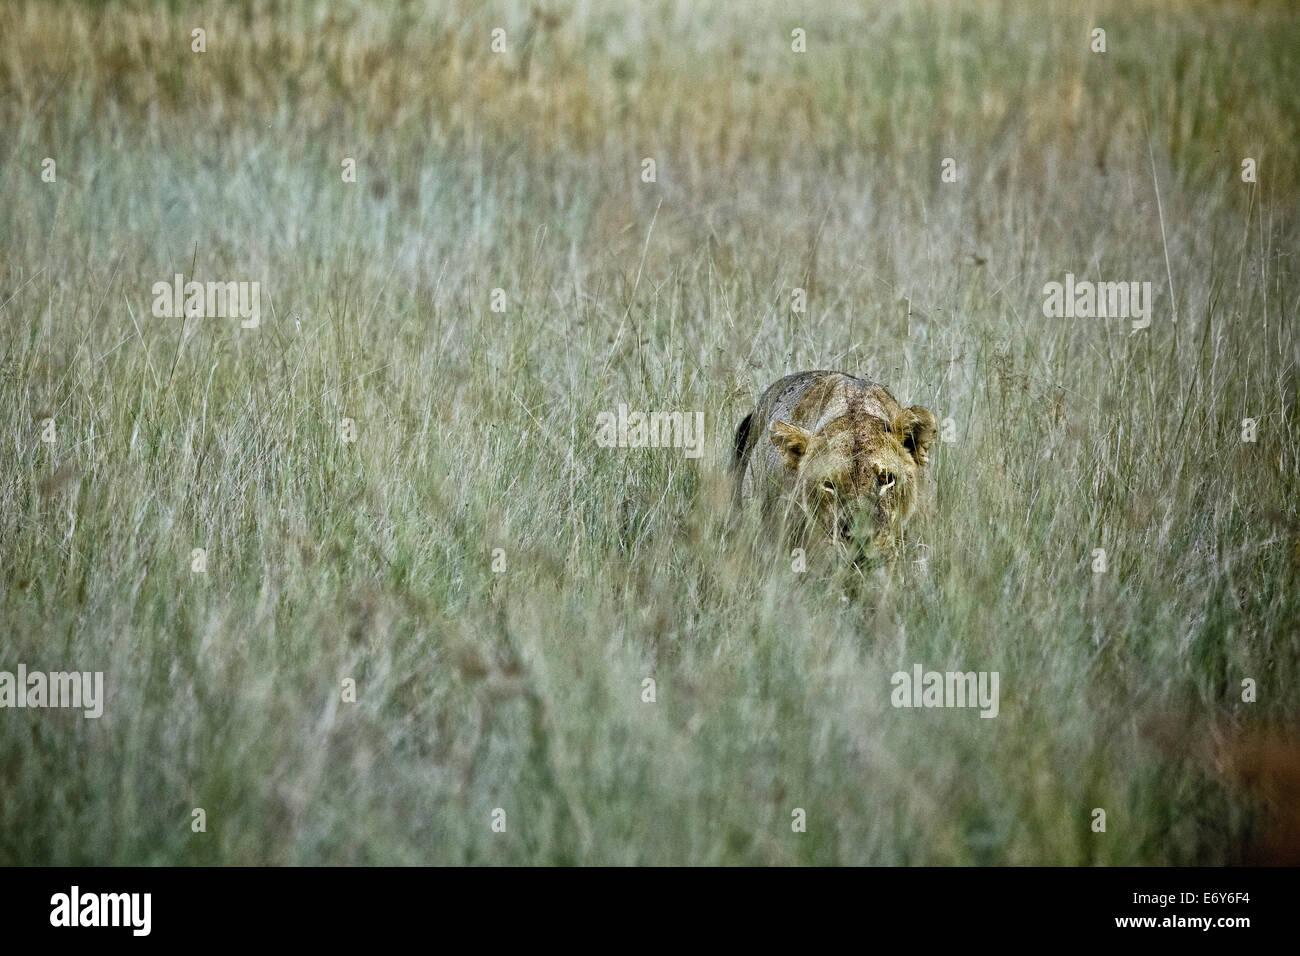 Lioness hiding in savannah grass, Okavango Delta, Botswana, Africa - Stock Image